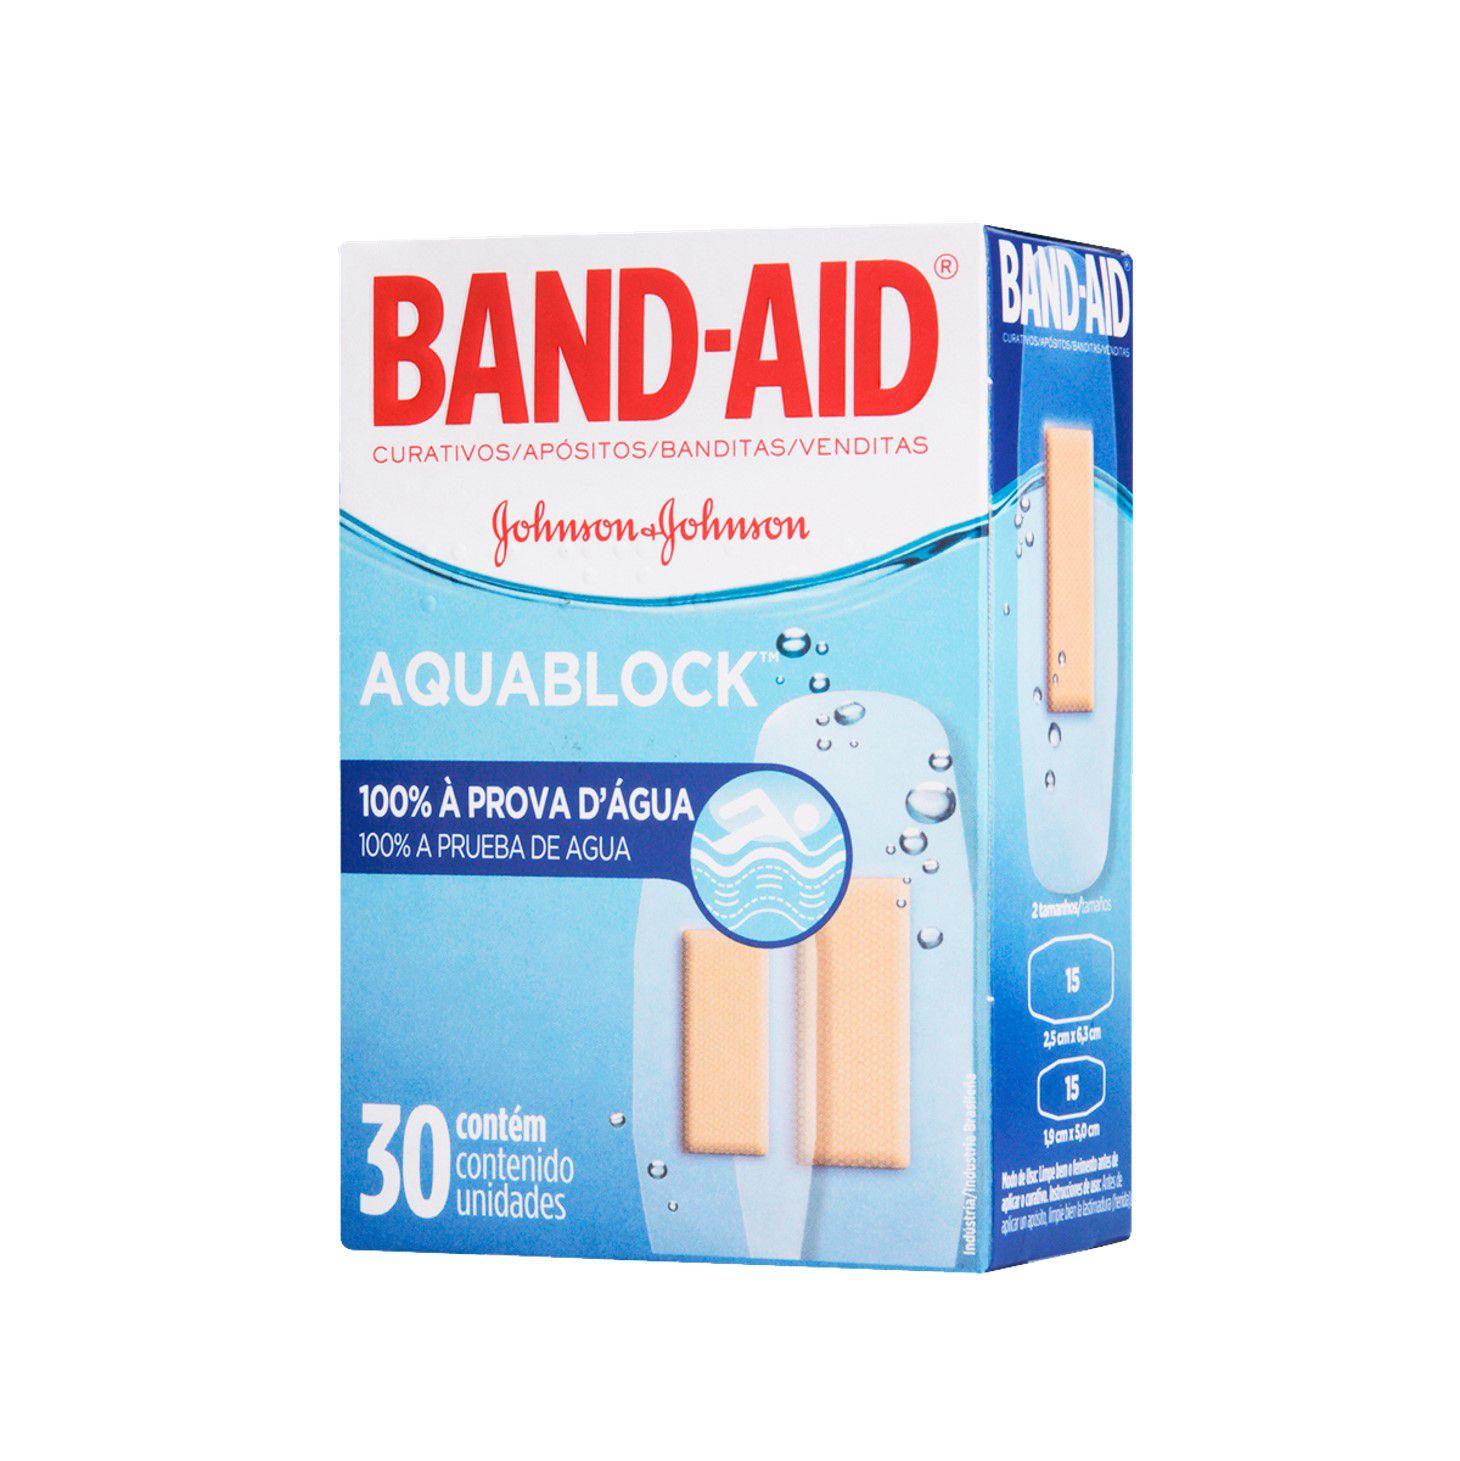 Curativos Band-Aid Aquablock 30 Unidades